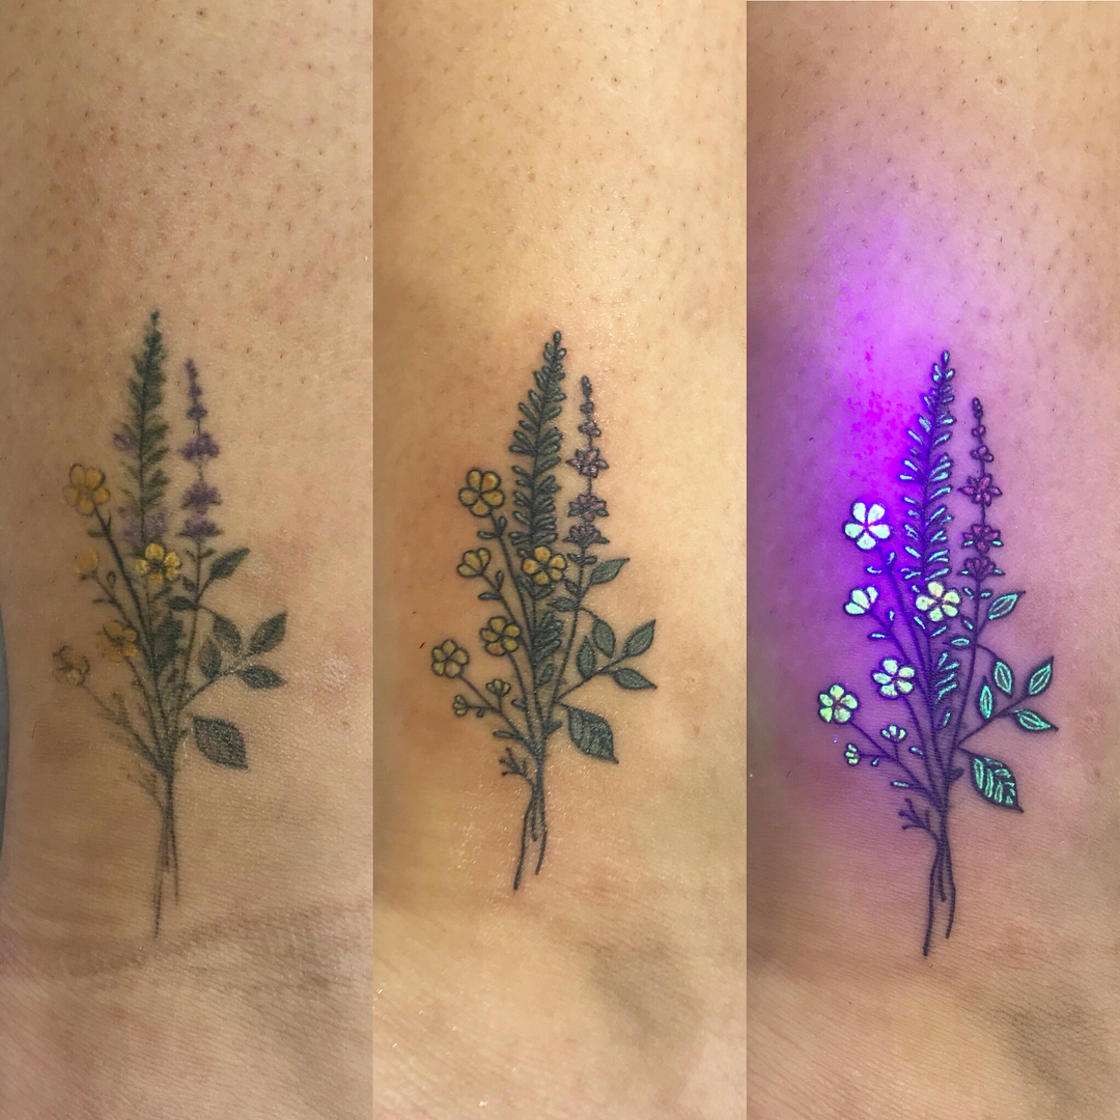 UV Tattoos – These tattoos reveal their secrets under a black light